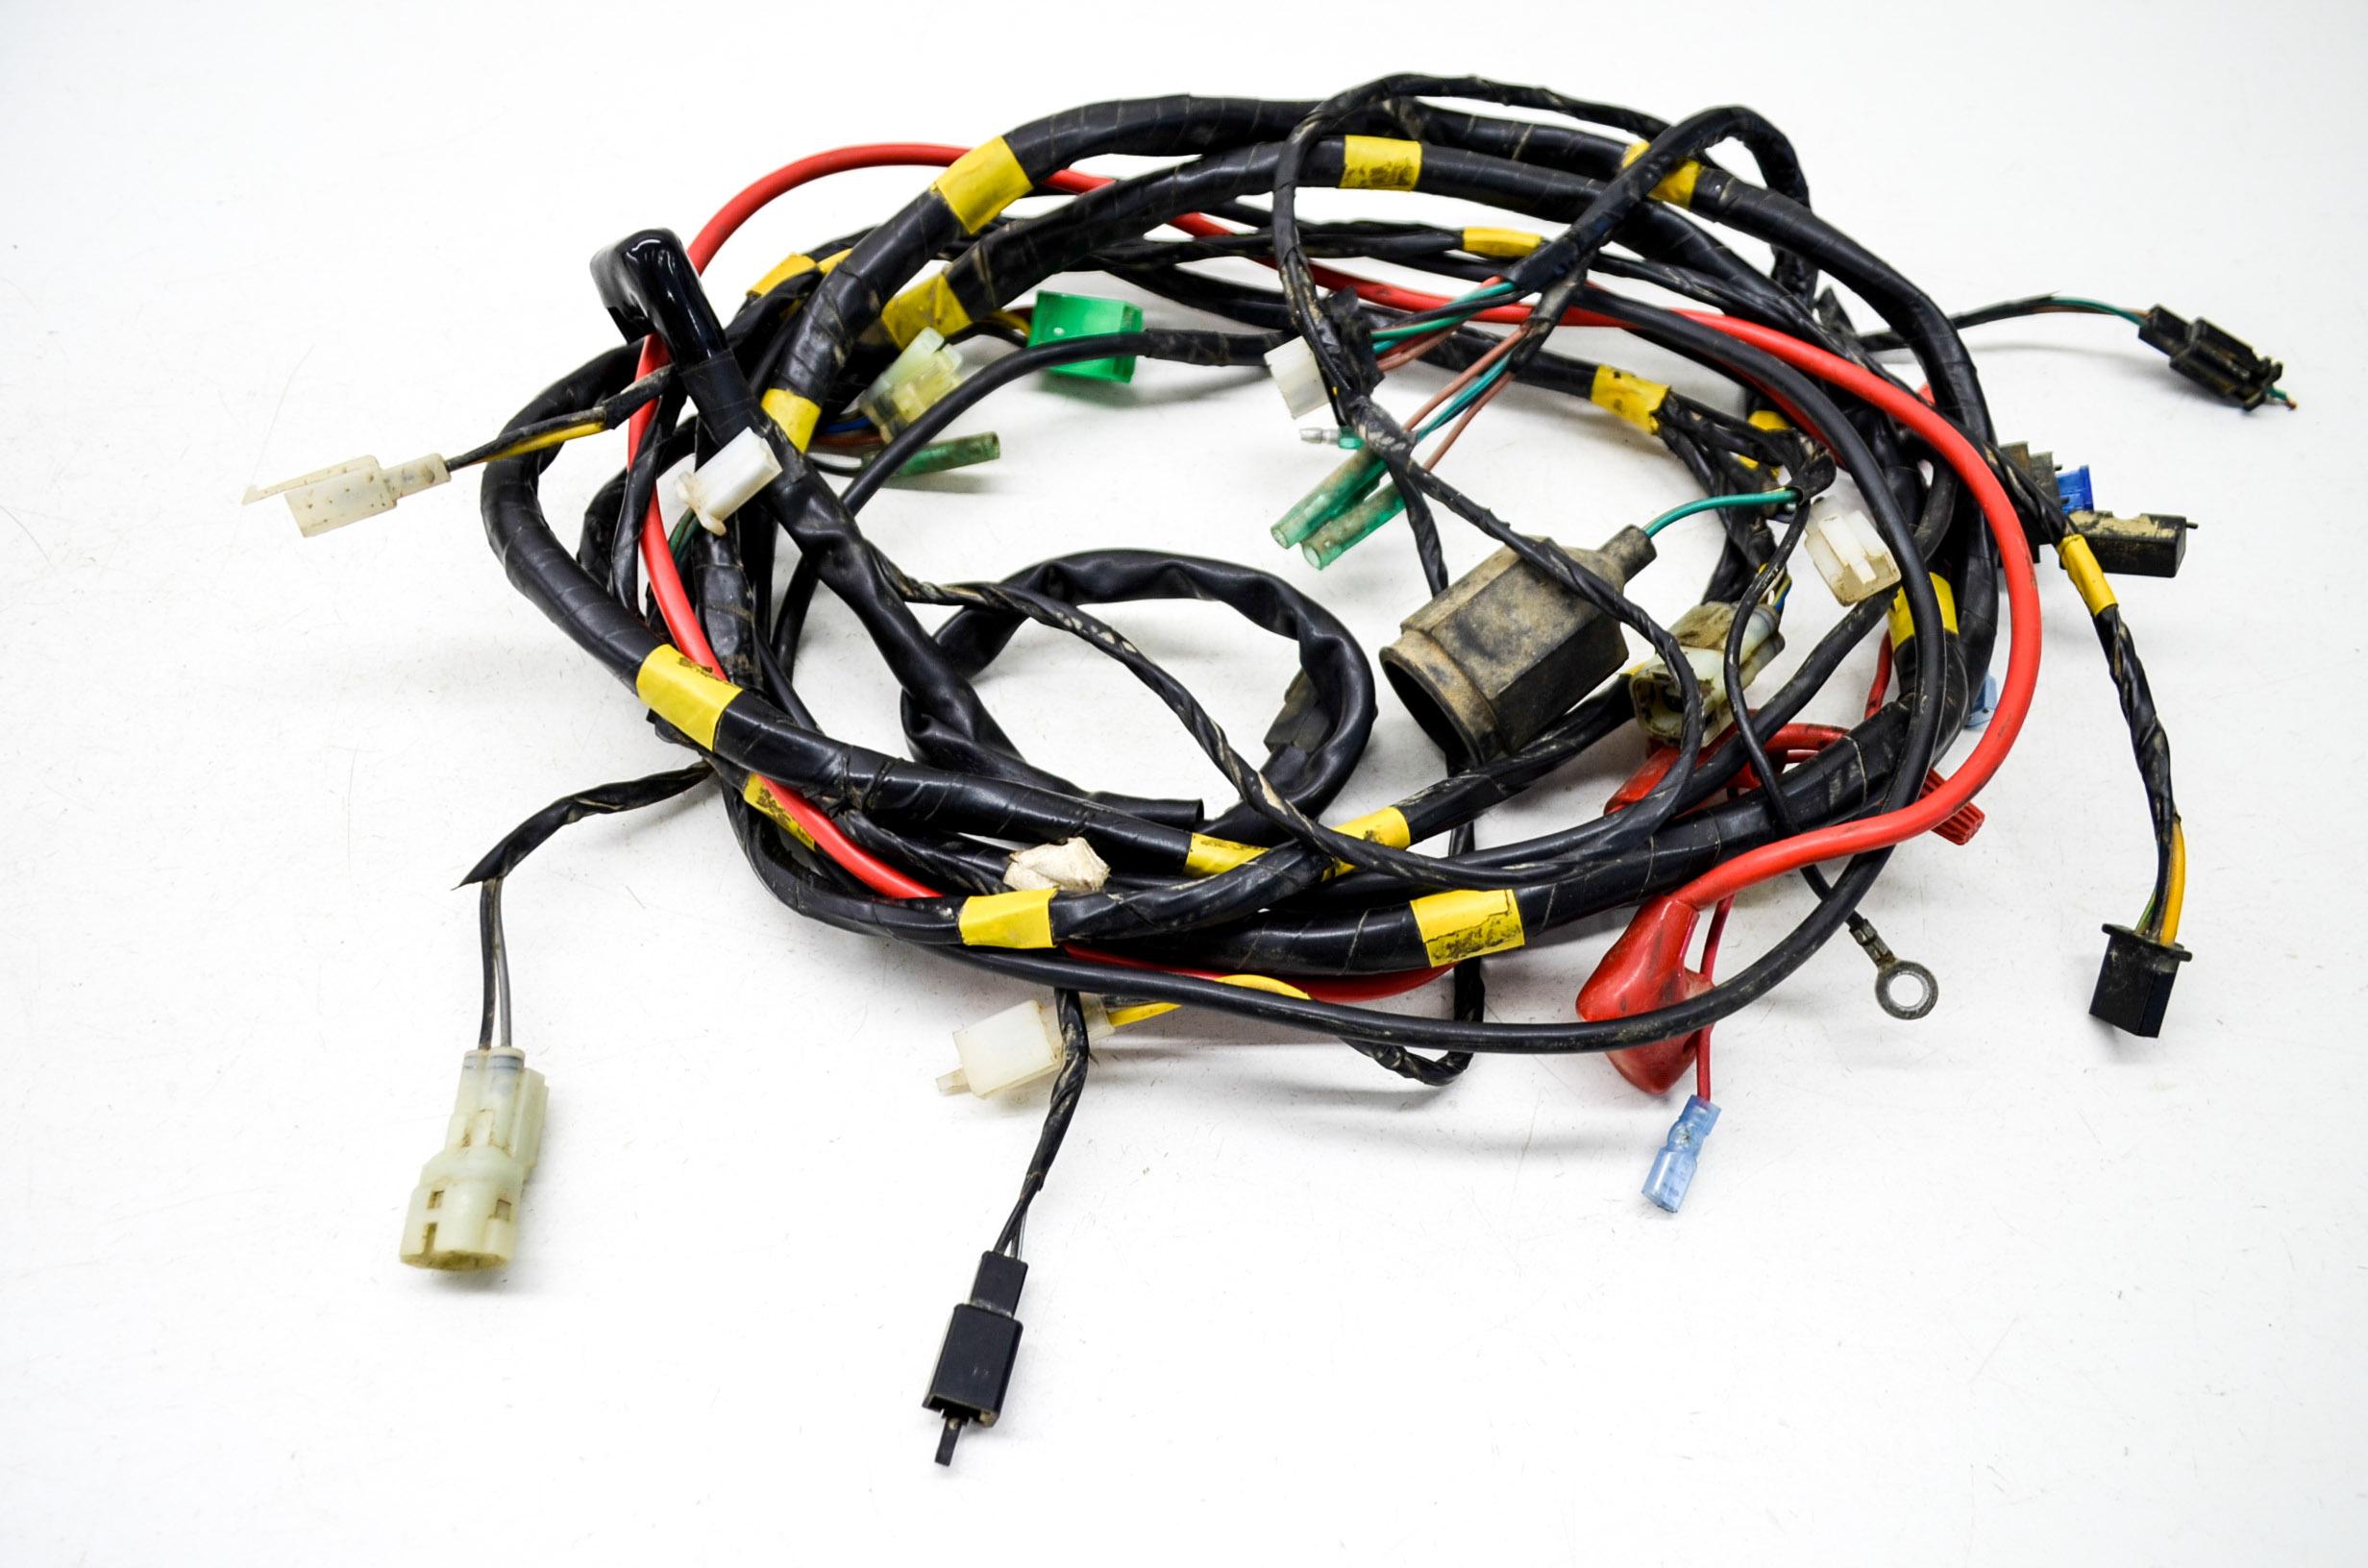 09 polaris rzr 170 wire harness electrical wiring ebay Body Harness 09 polaris rzr 170 wire harness electrical wiring